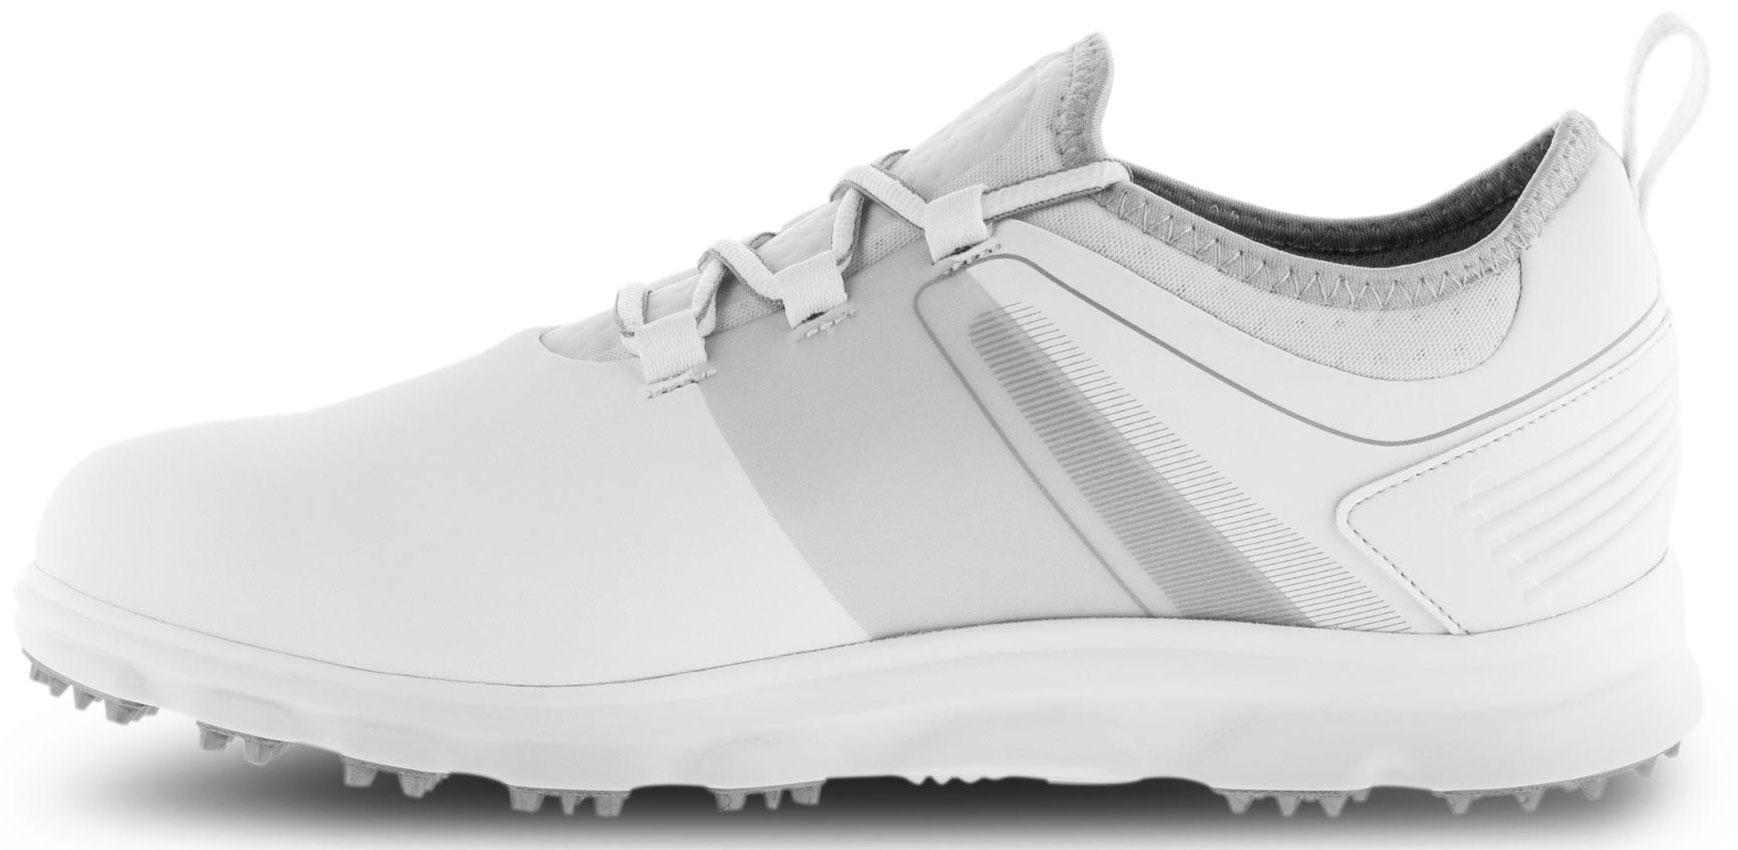 FootJoy-Superlites-XP-Golf-Shoes-Men-039-s-New thumbnail 16